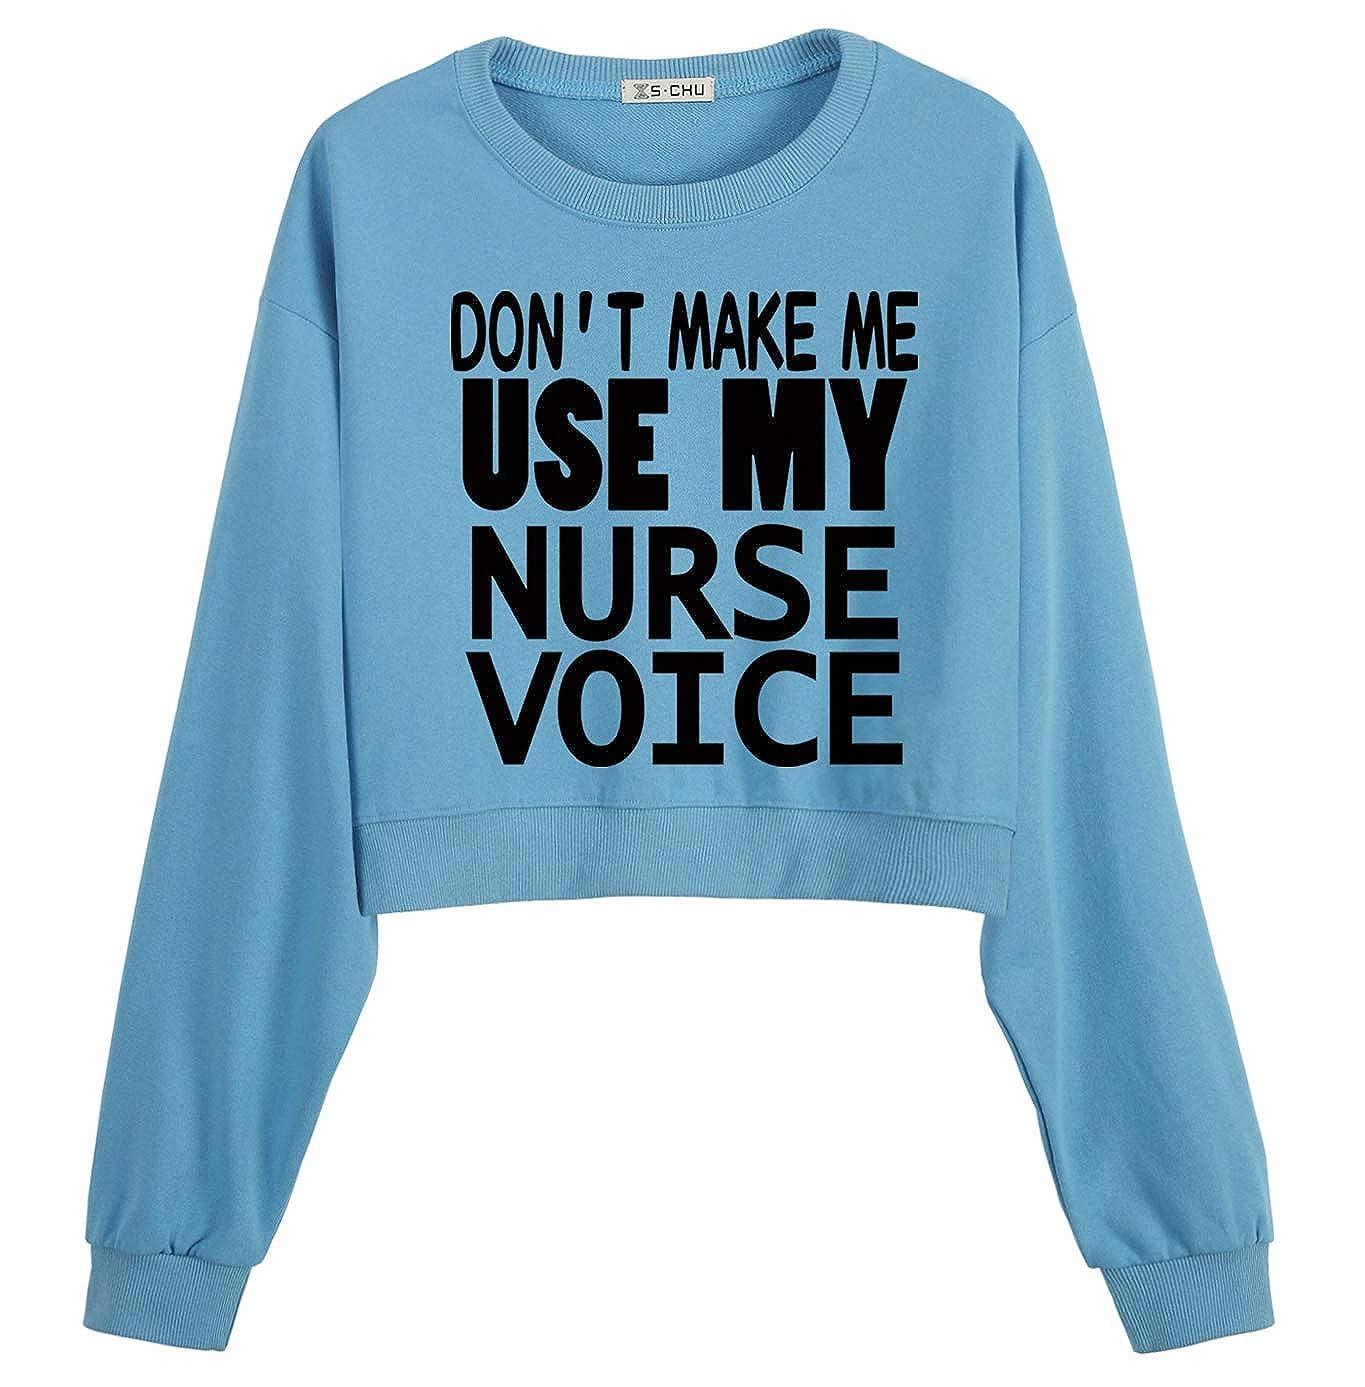 S.CHU Womens Dont Use My Nurse Voice Printed Crop Sweatshirt Pullover